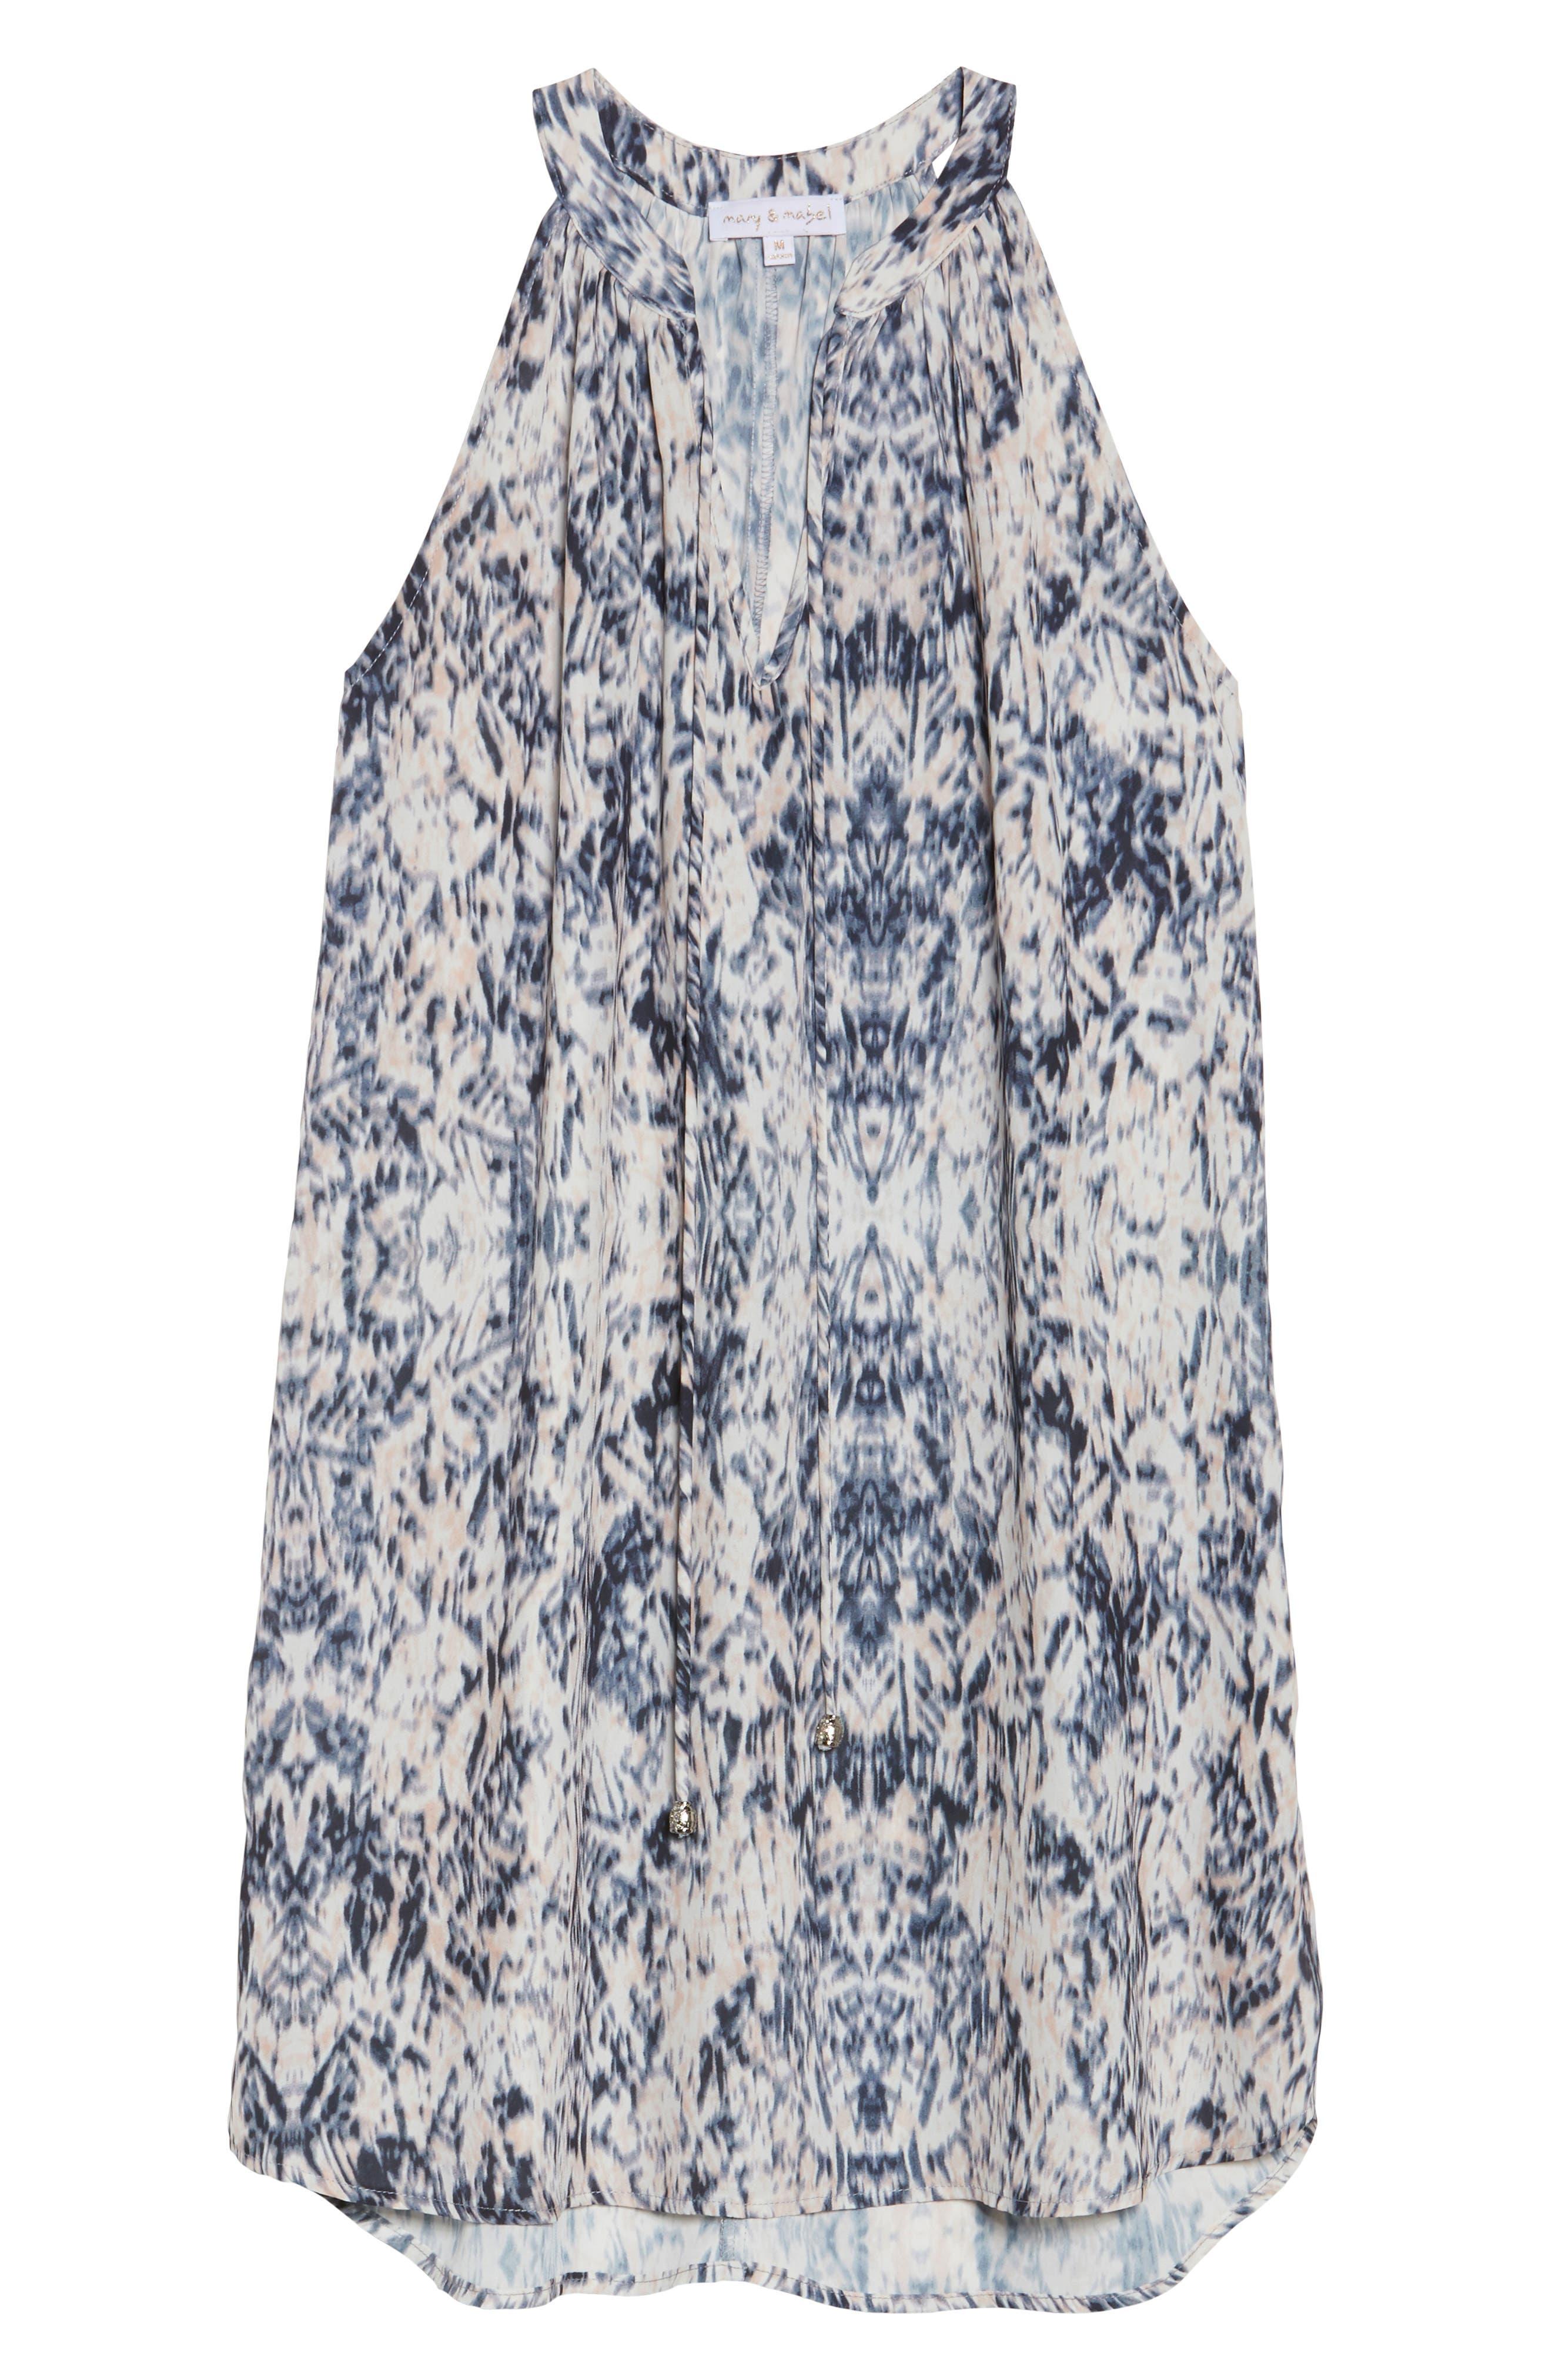 Tie Neck Sleeveless Dress,                             Alternate thumbnail 6, color,                             900